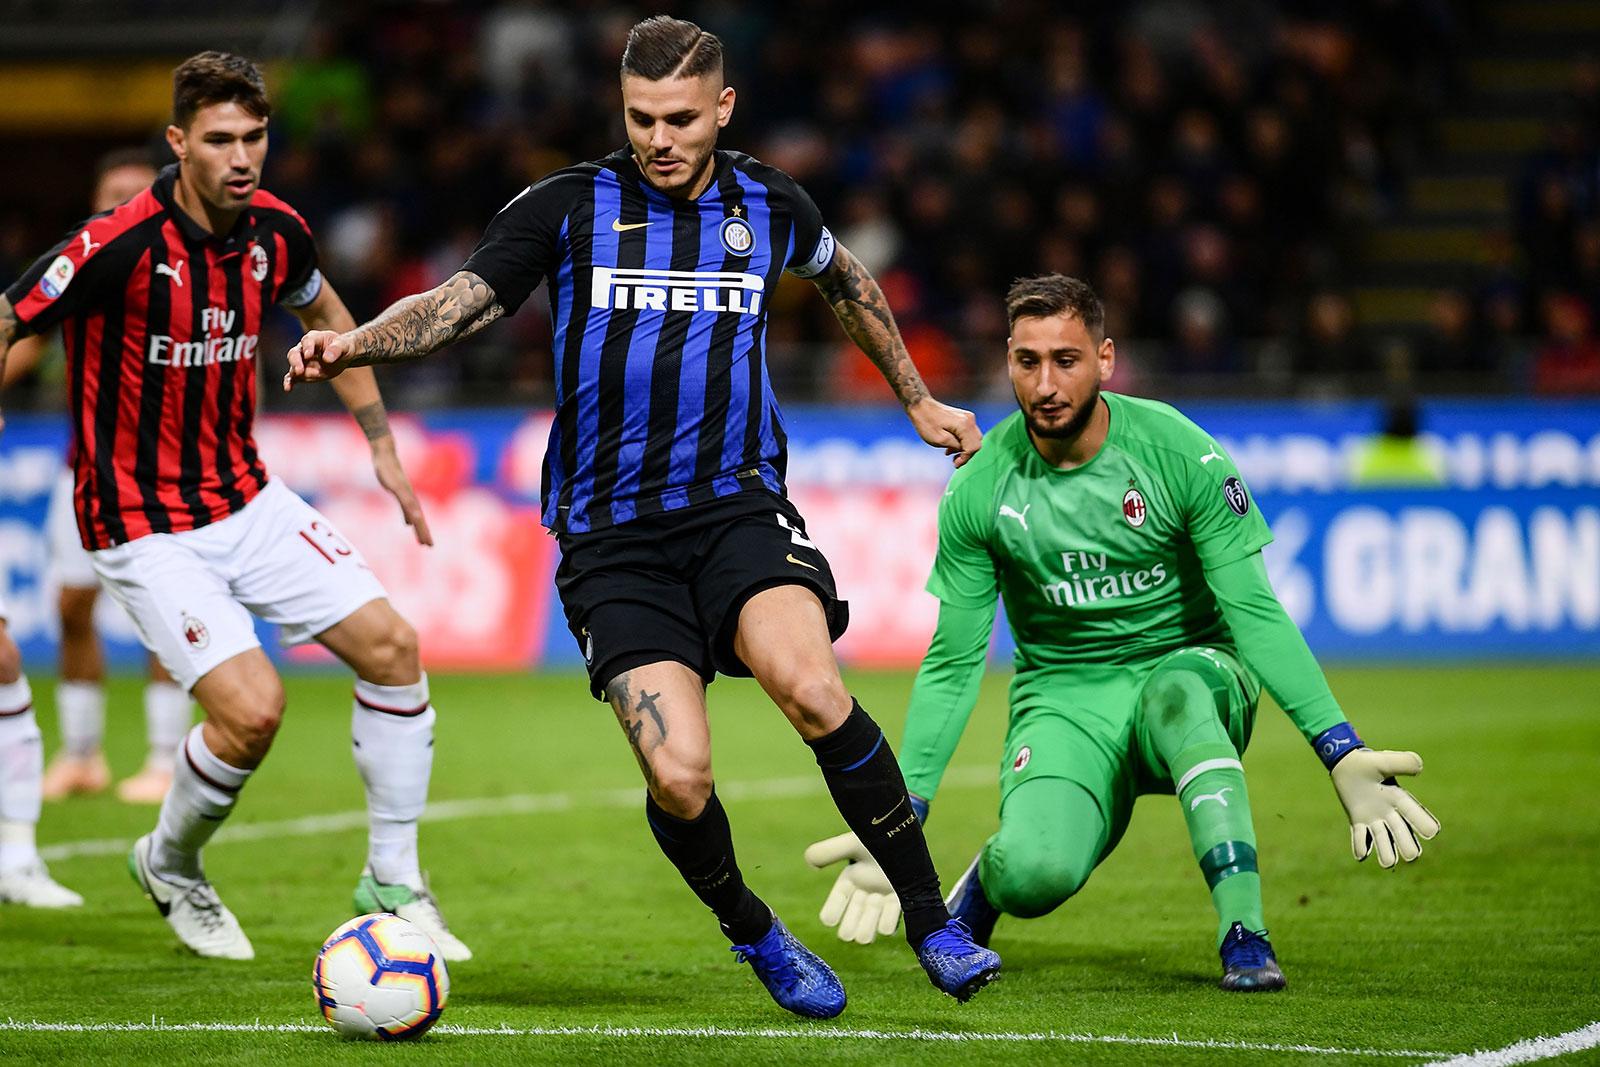 Mauro Icardi, Gianluigi Donnarumma and Alessio Romagnoli during Inter-Milan at Stadio San Siro on October 21, 2018. (MARCO BERTORELLO/AFP/Getty Images)